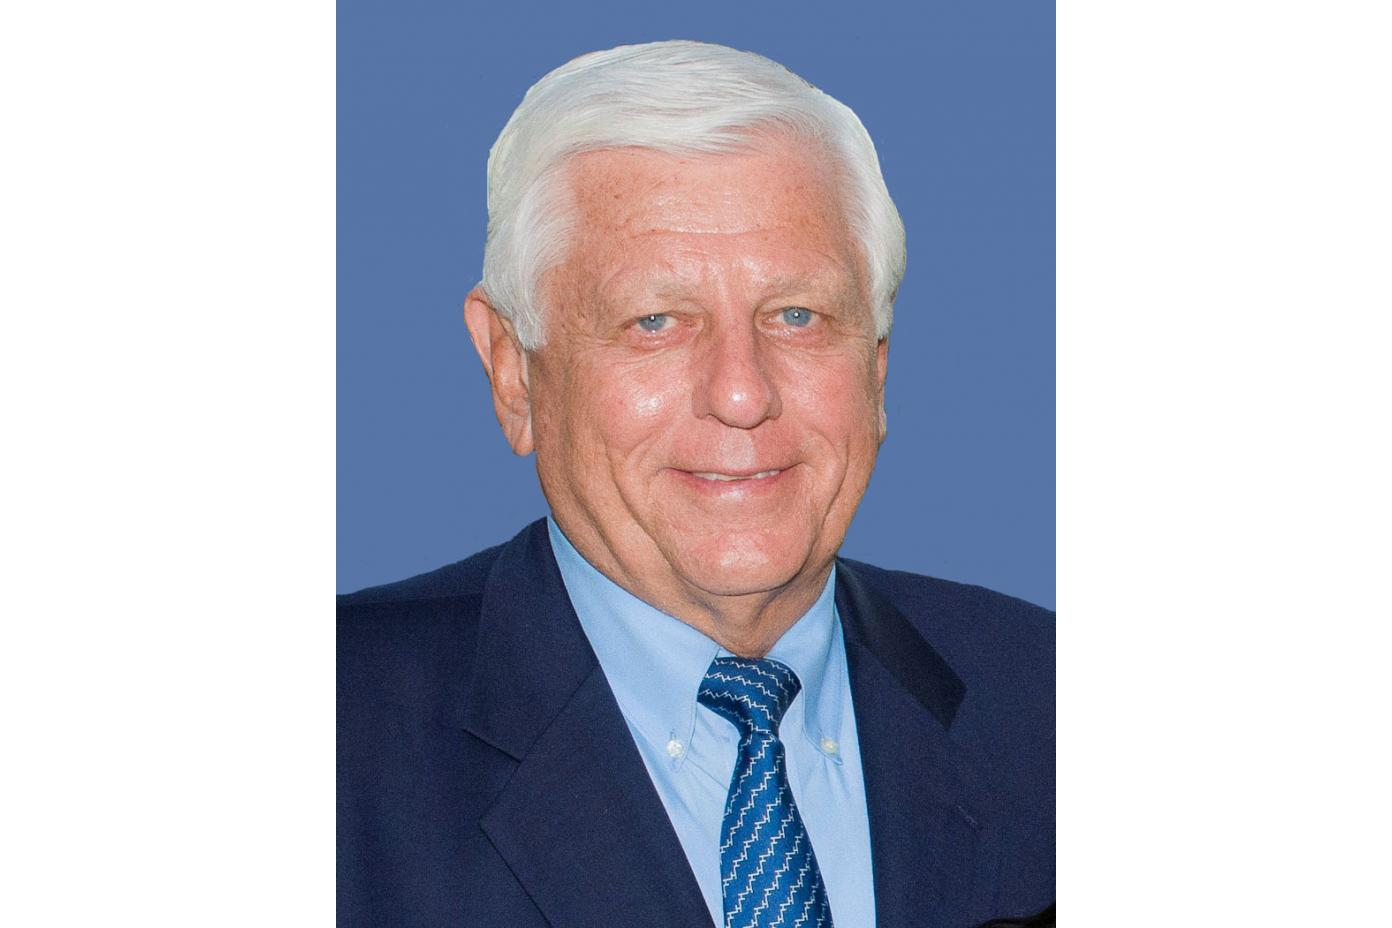 Photo of Charles Hennekens courtesy of Florida Atlantic University College of Medicine.